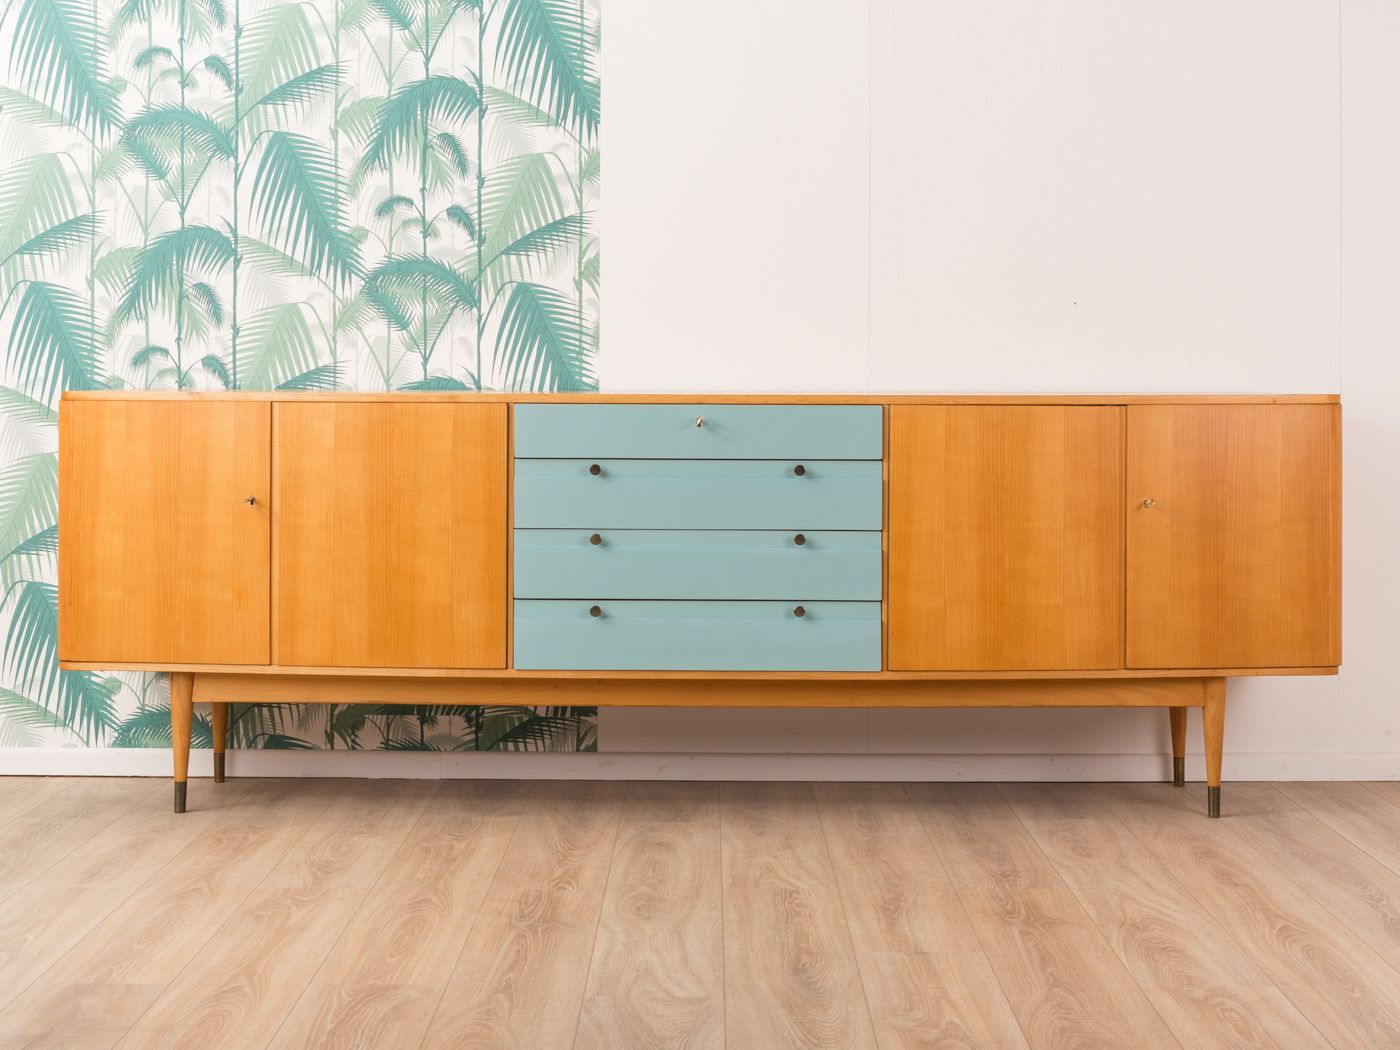 Denia Badkommode Design Kommode Schlafzimmer Kommoden